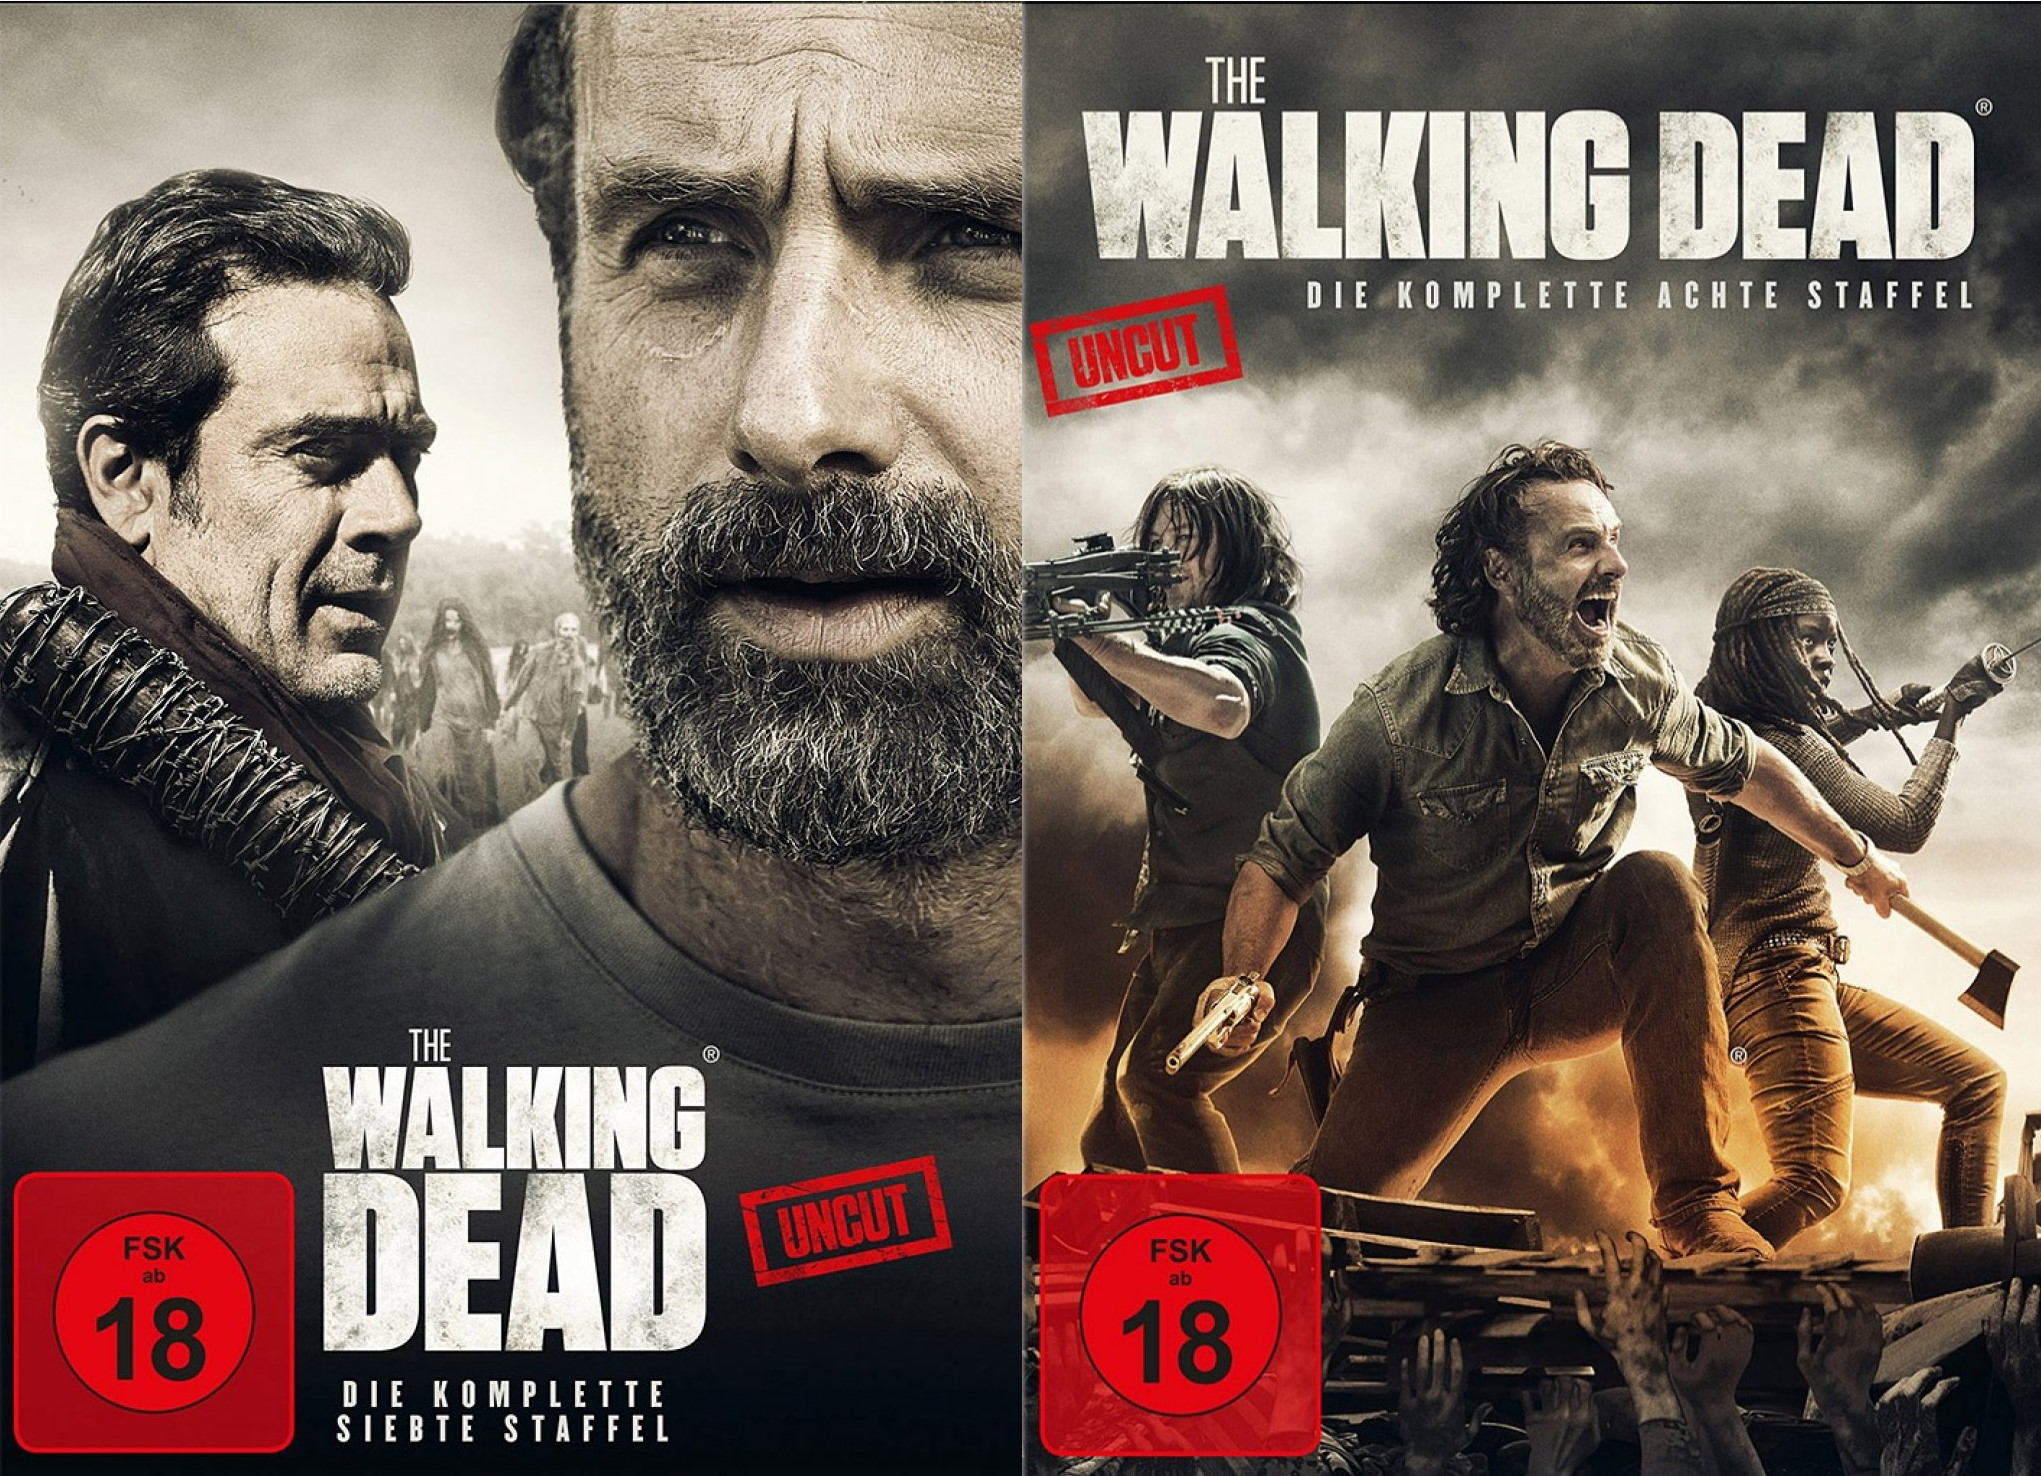 Walking Dead Staffel 6 Auf Dvd